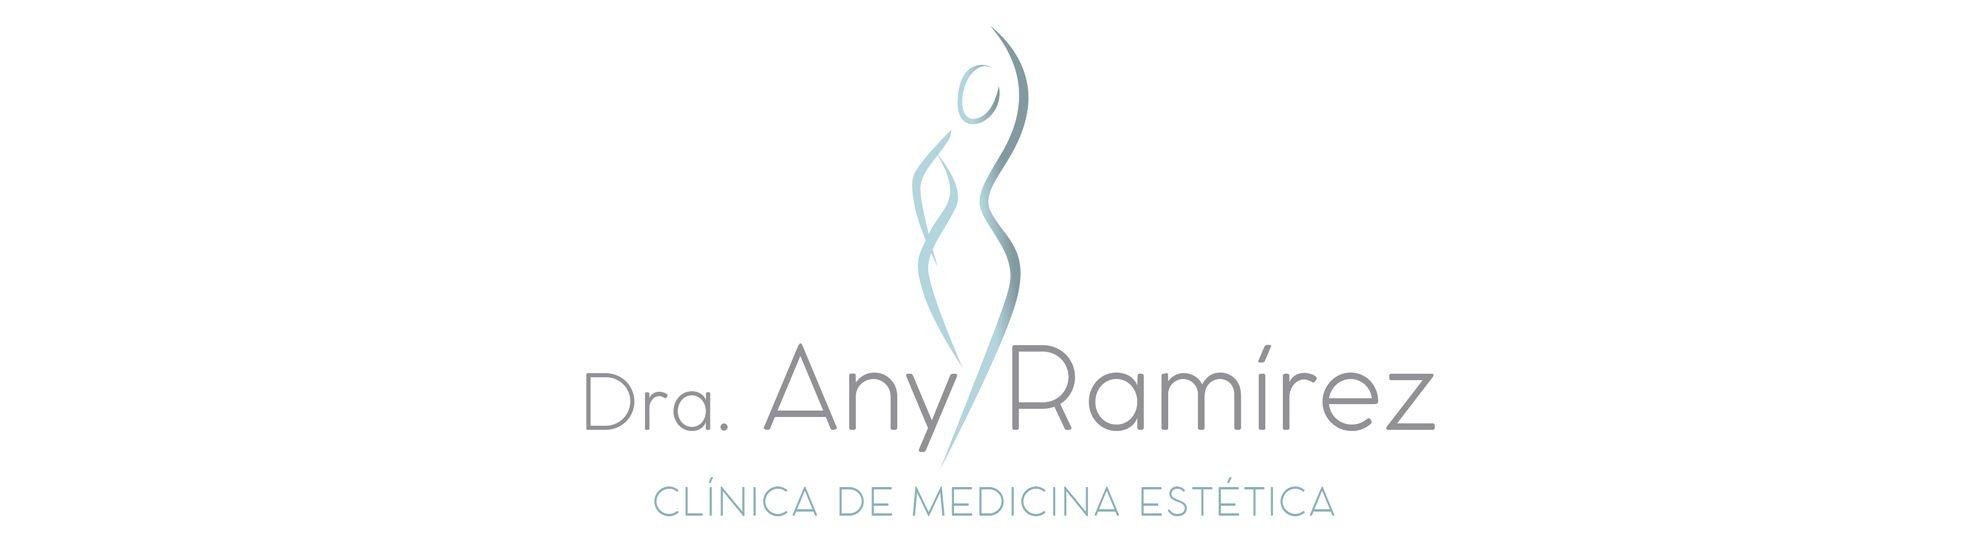 Dra. Any Ramírez